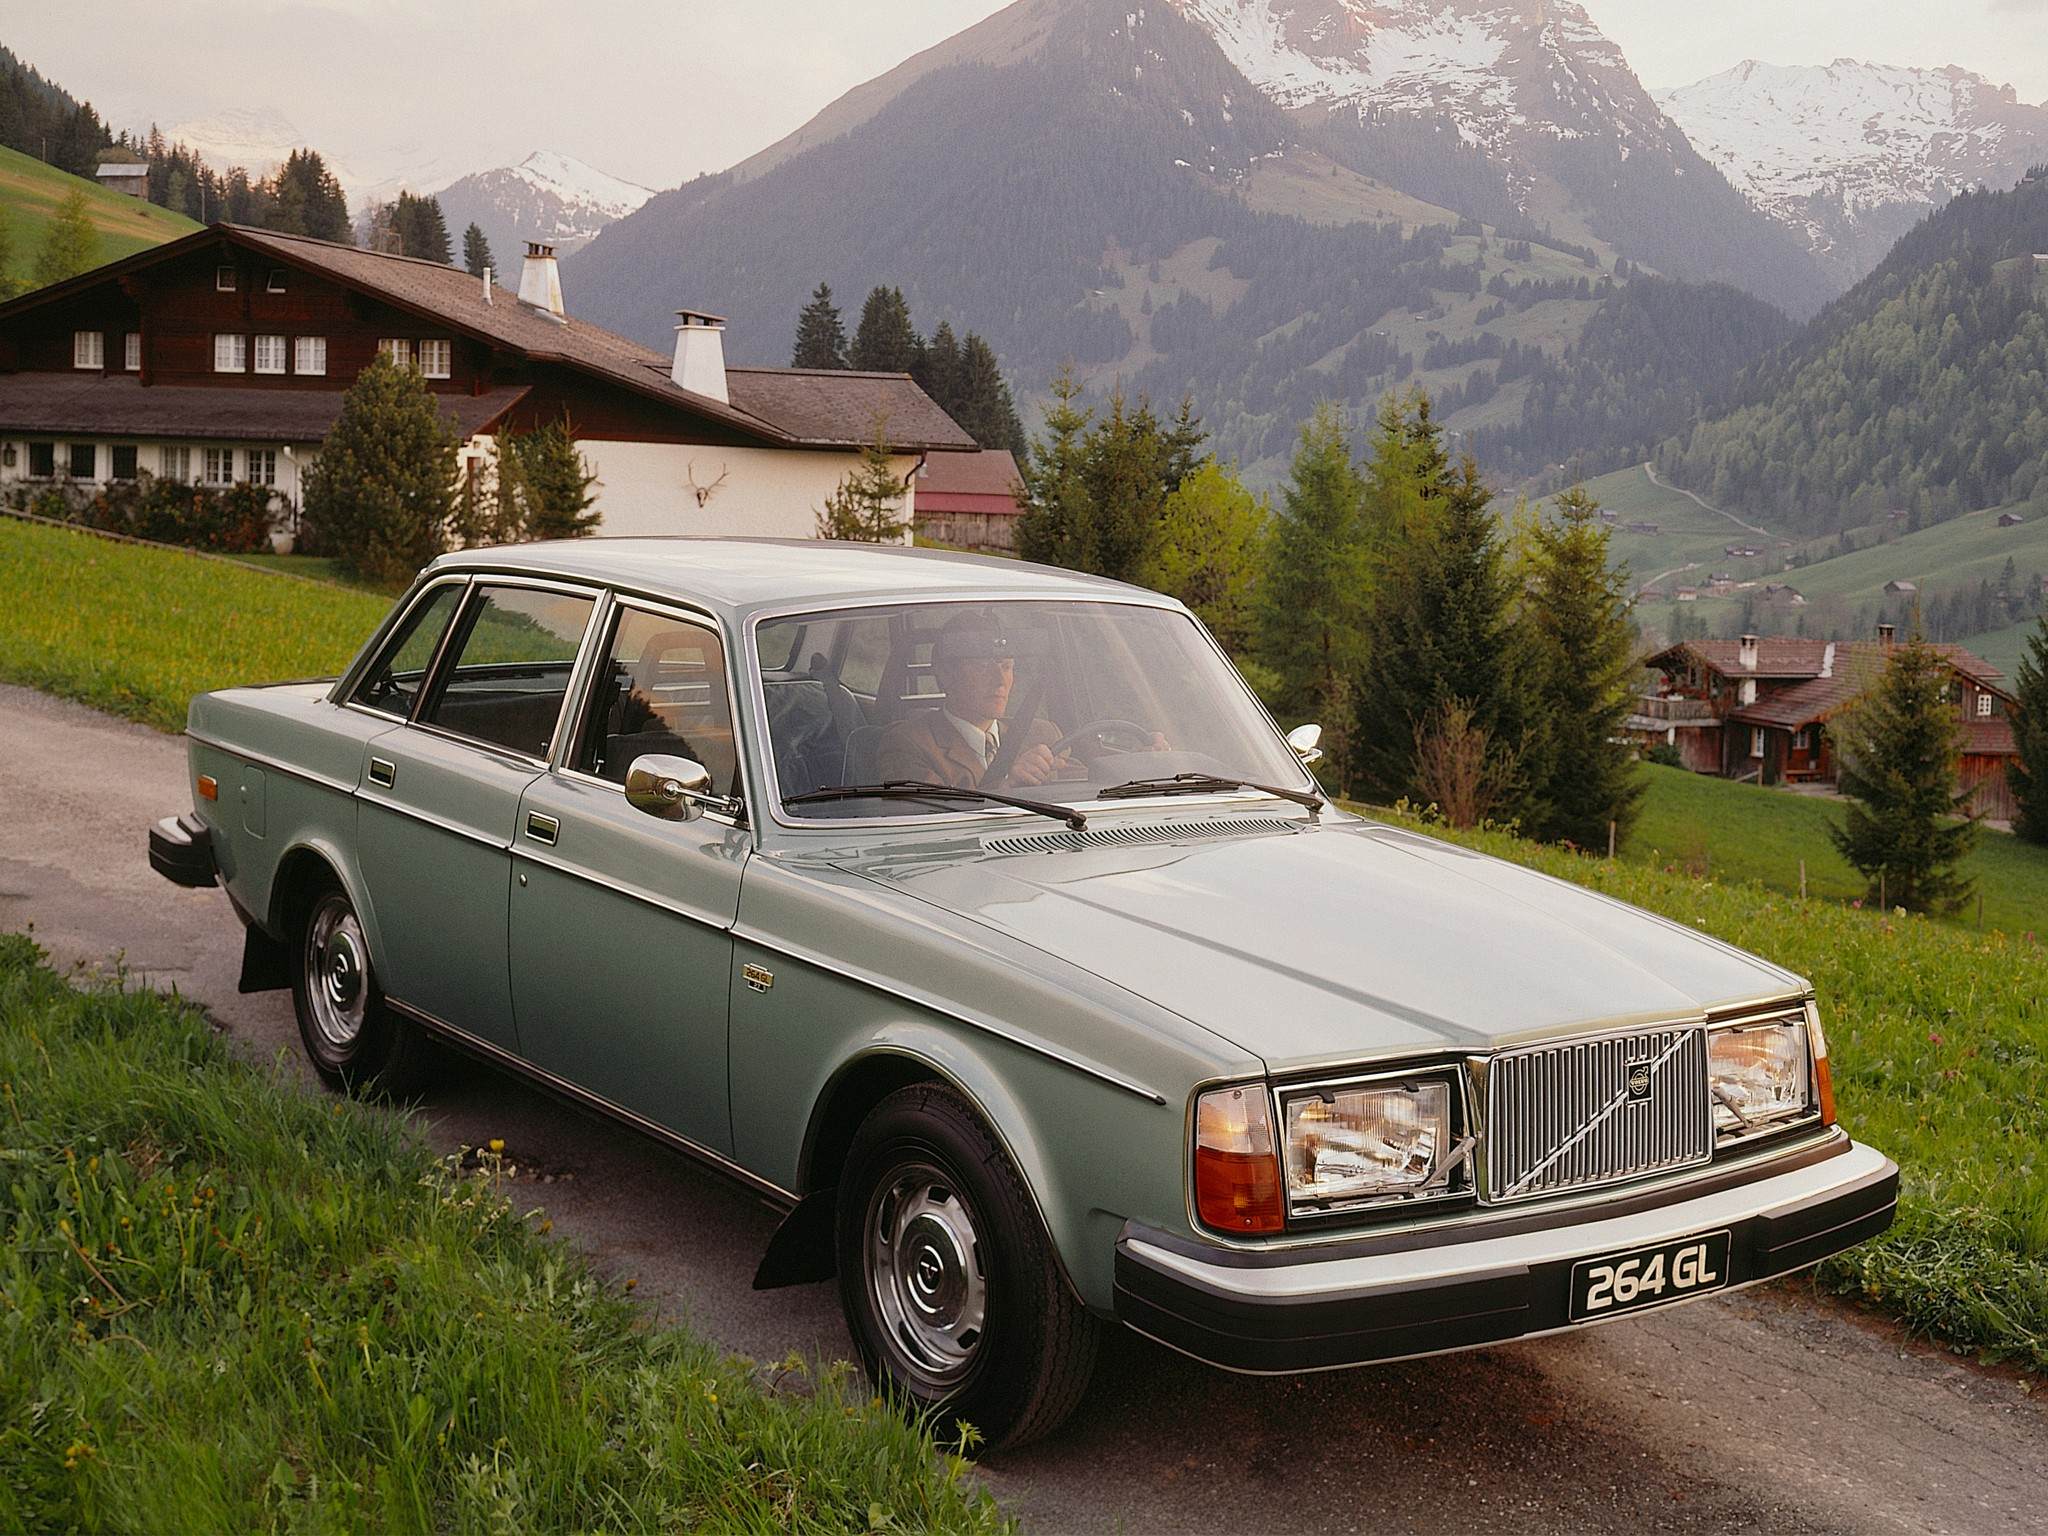 VOLVO 264 - 1980, 1981, 1982 - autoevolution